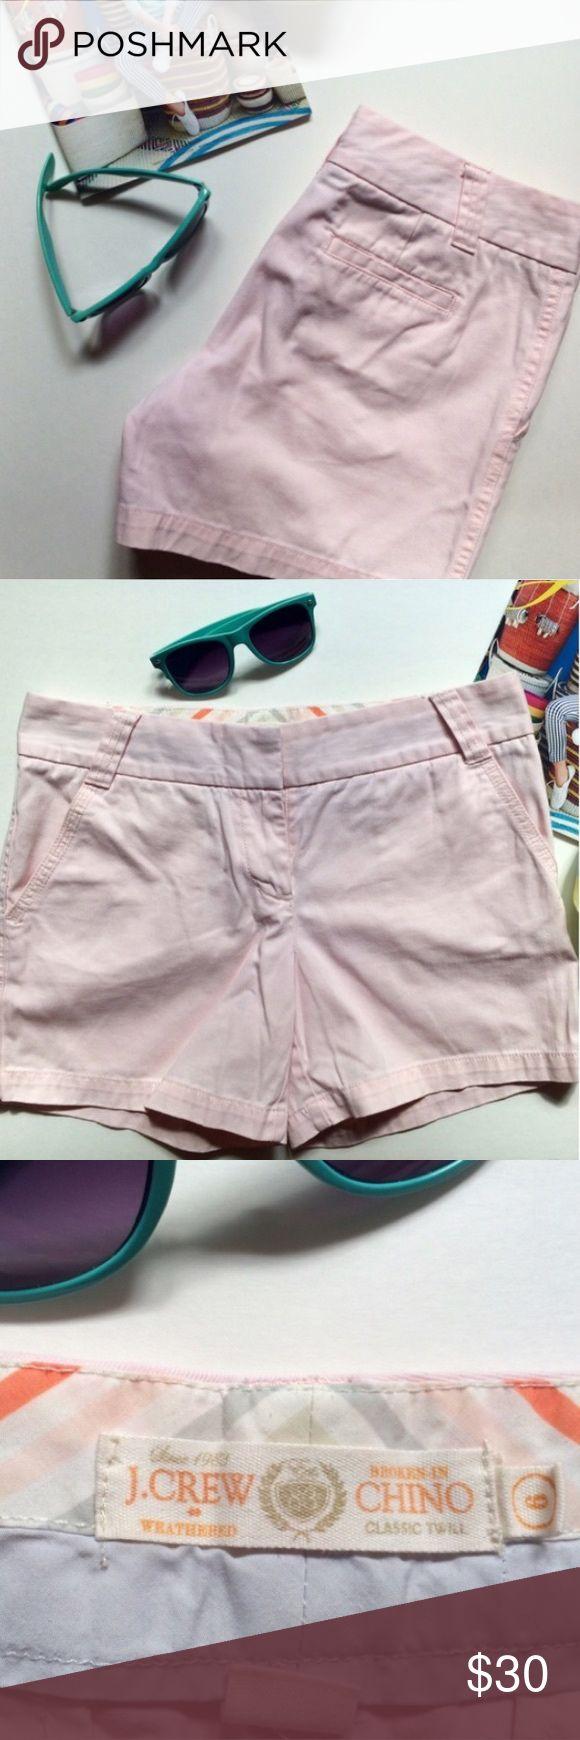 "J. Crew 5"" Broken-In Classic Chino Shorts J. Crew Broken-In Classic Chino Shorts • Size 6 • 5"" inseam • Pale Pink • J. Crew Shorts"